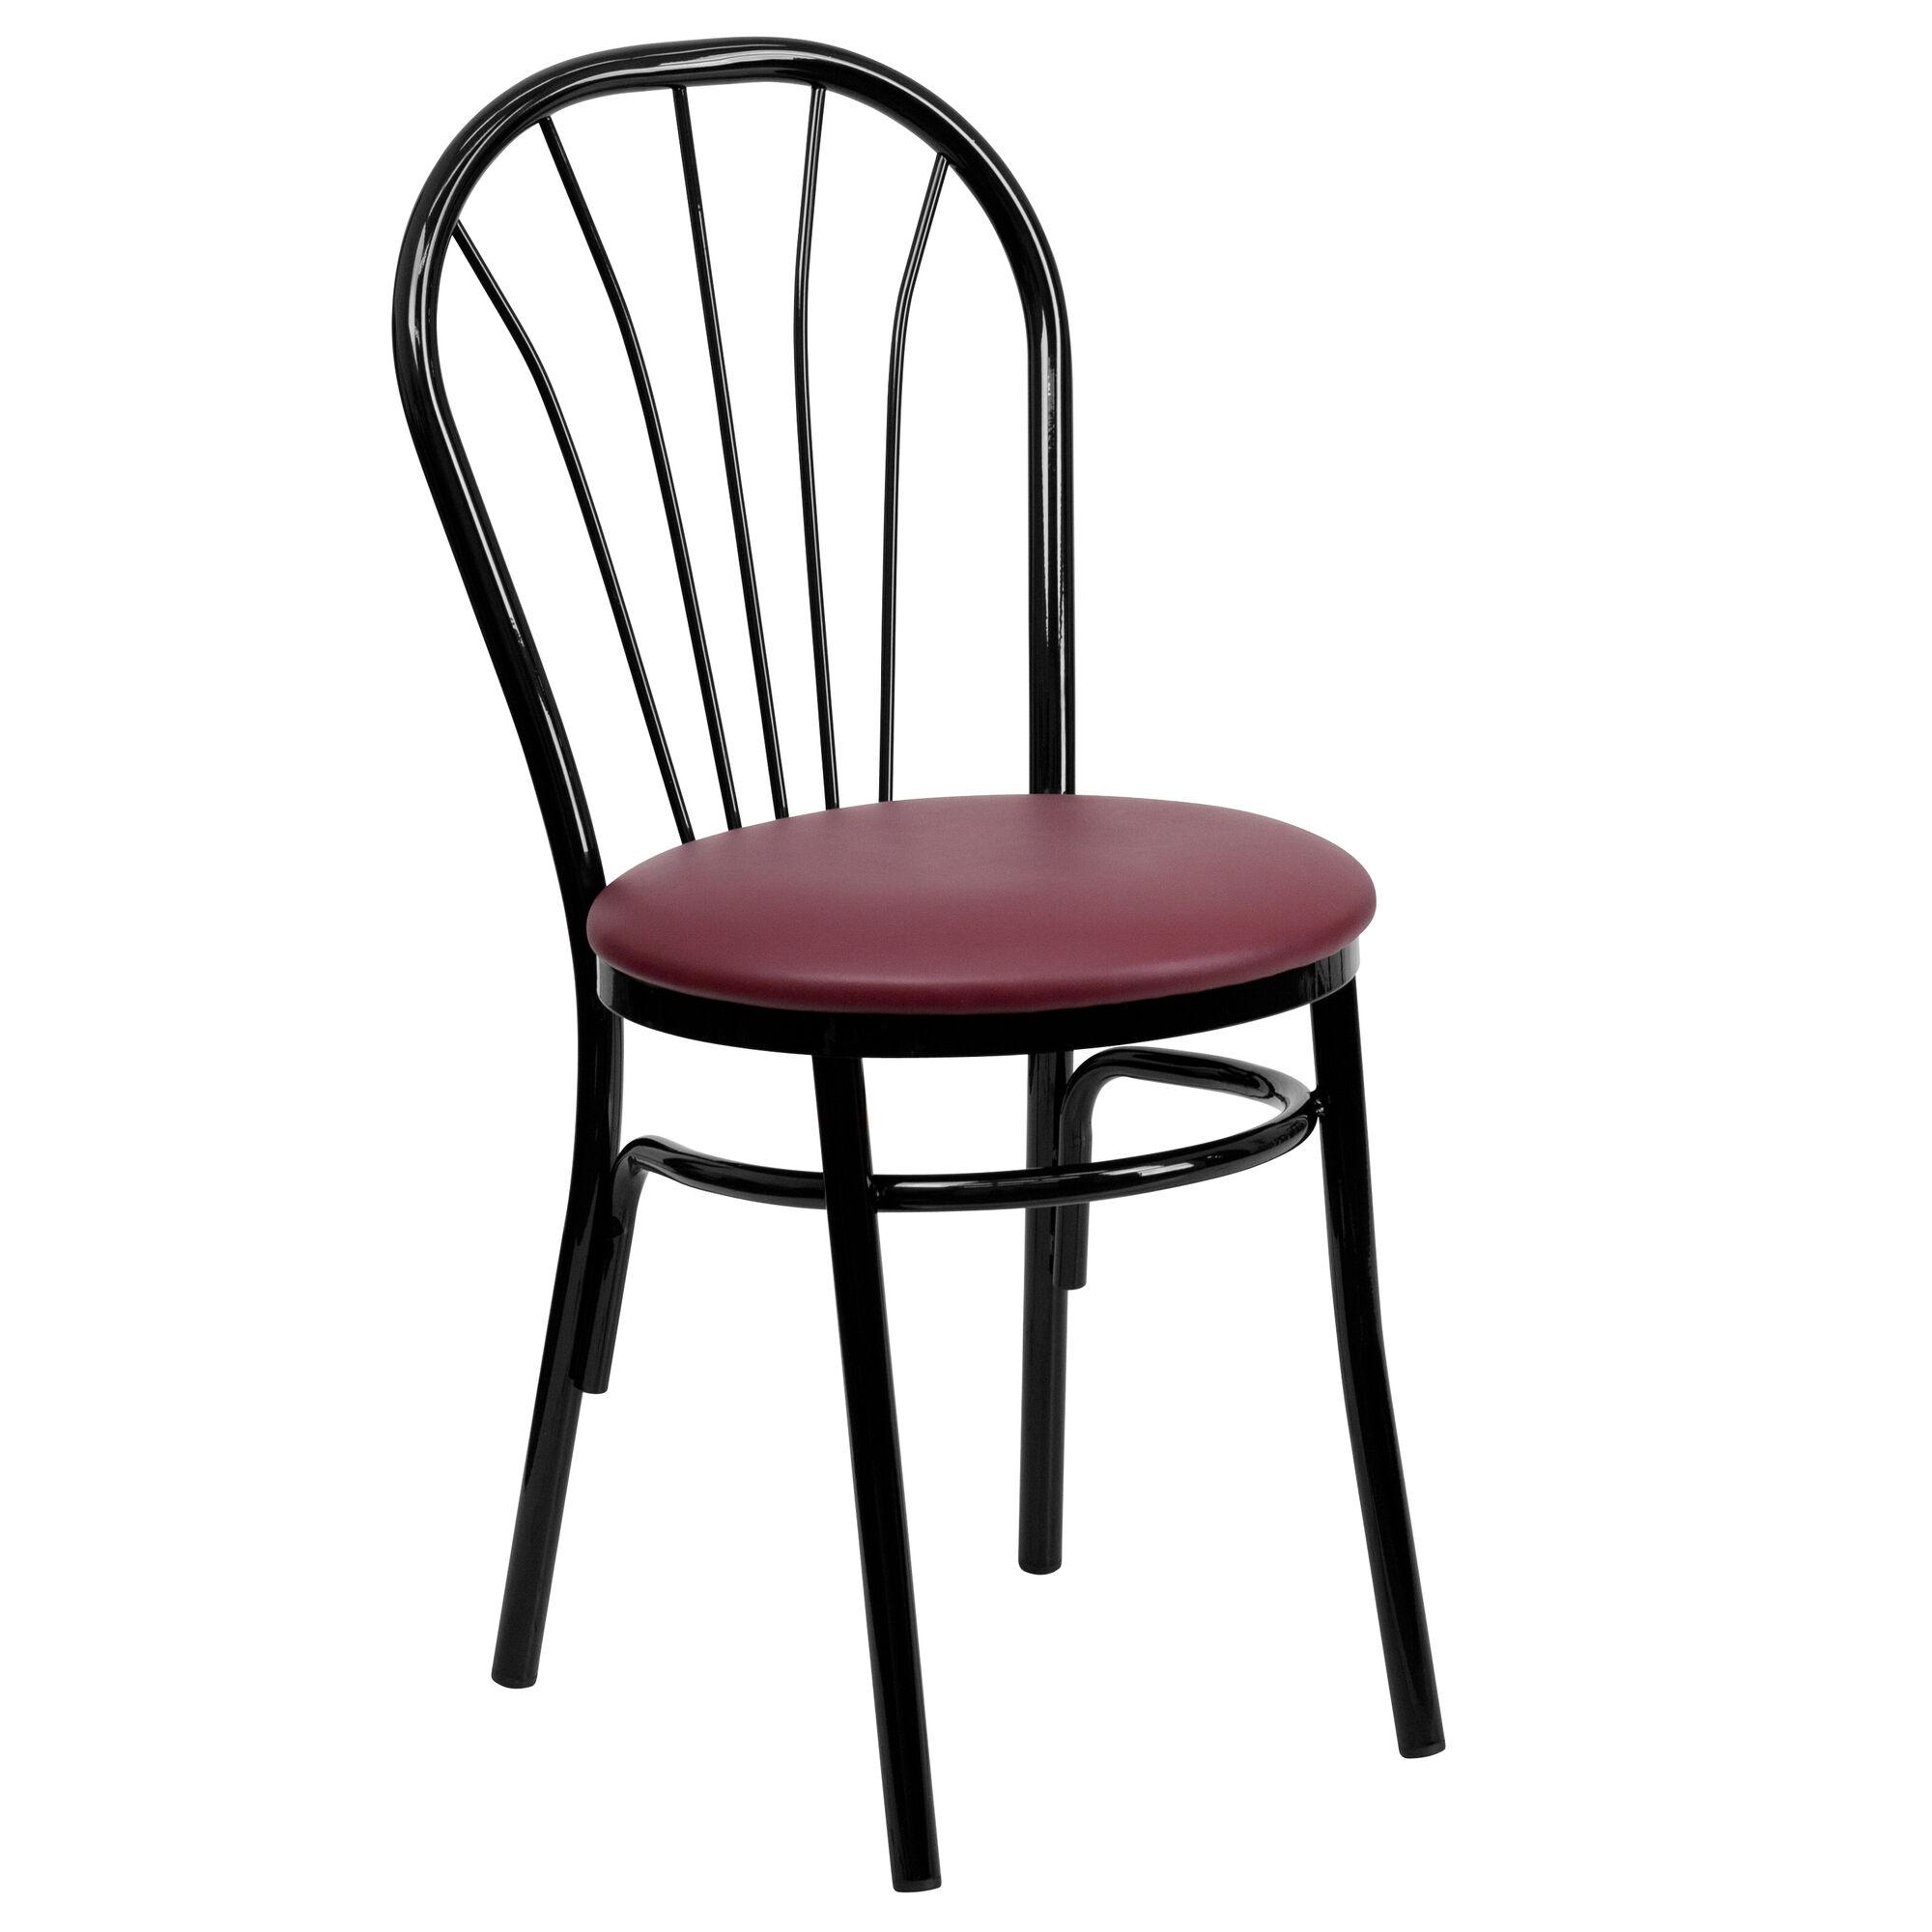 Black Fan Chair Burg Seat Bfdh 706698 By Tdr Bizchair Com